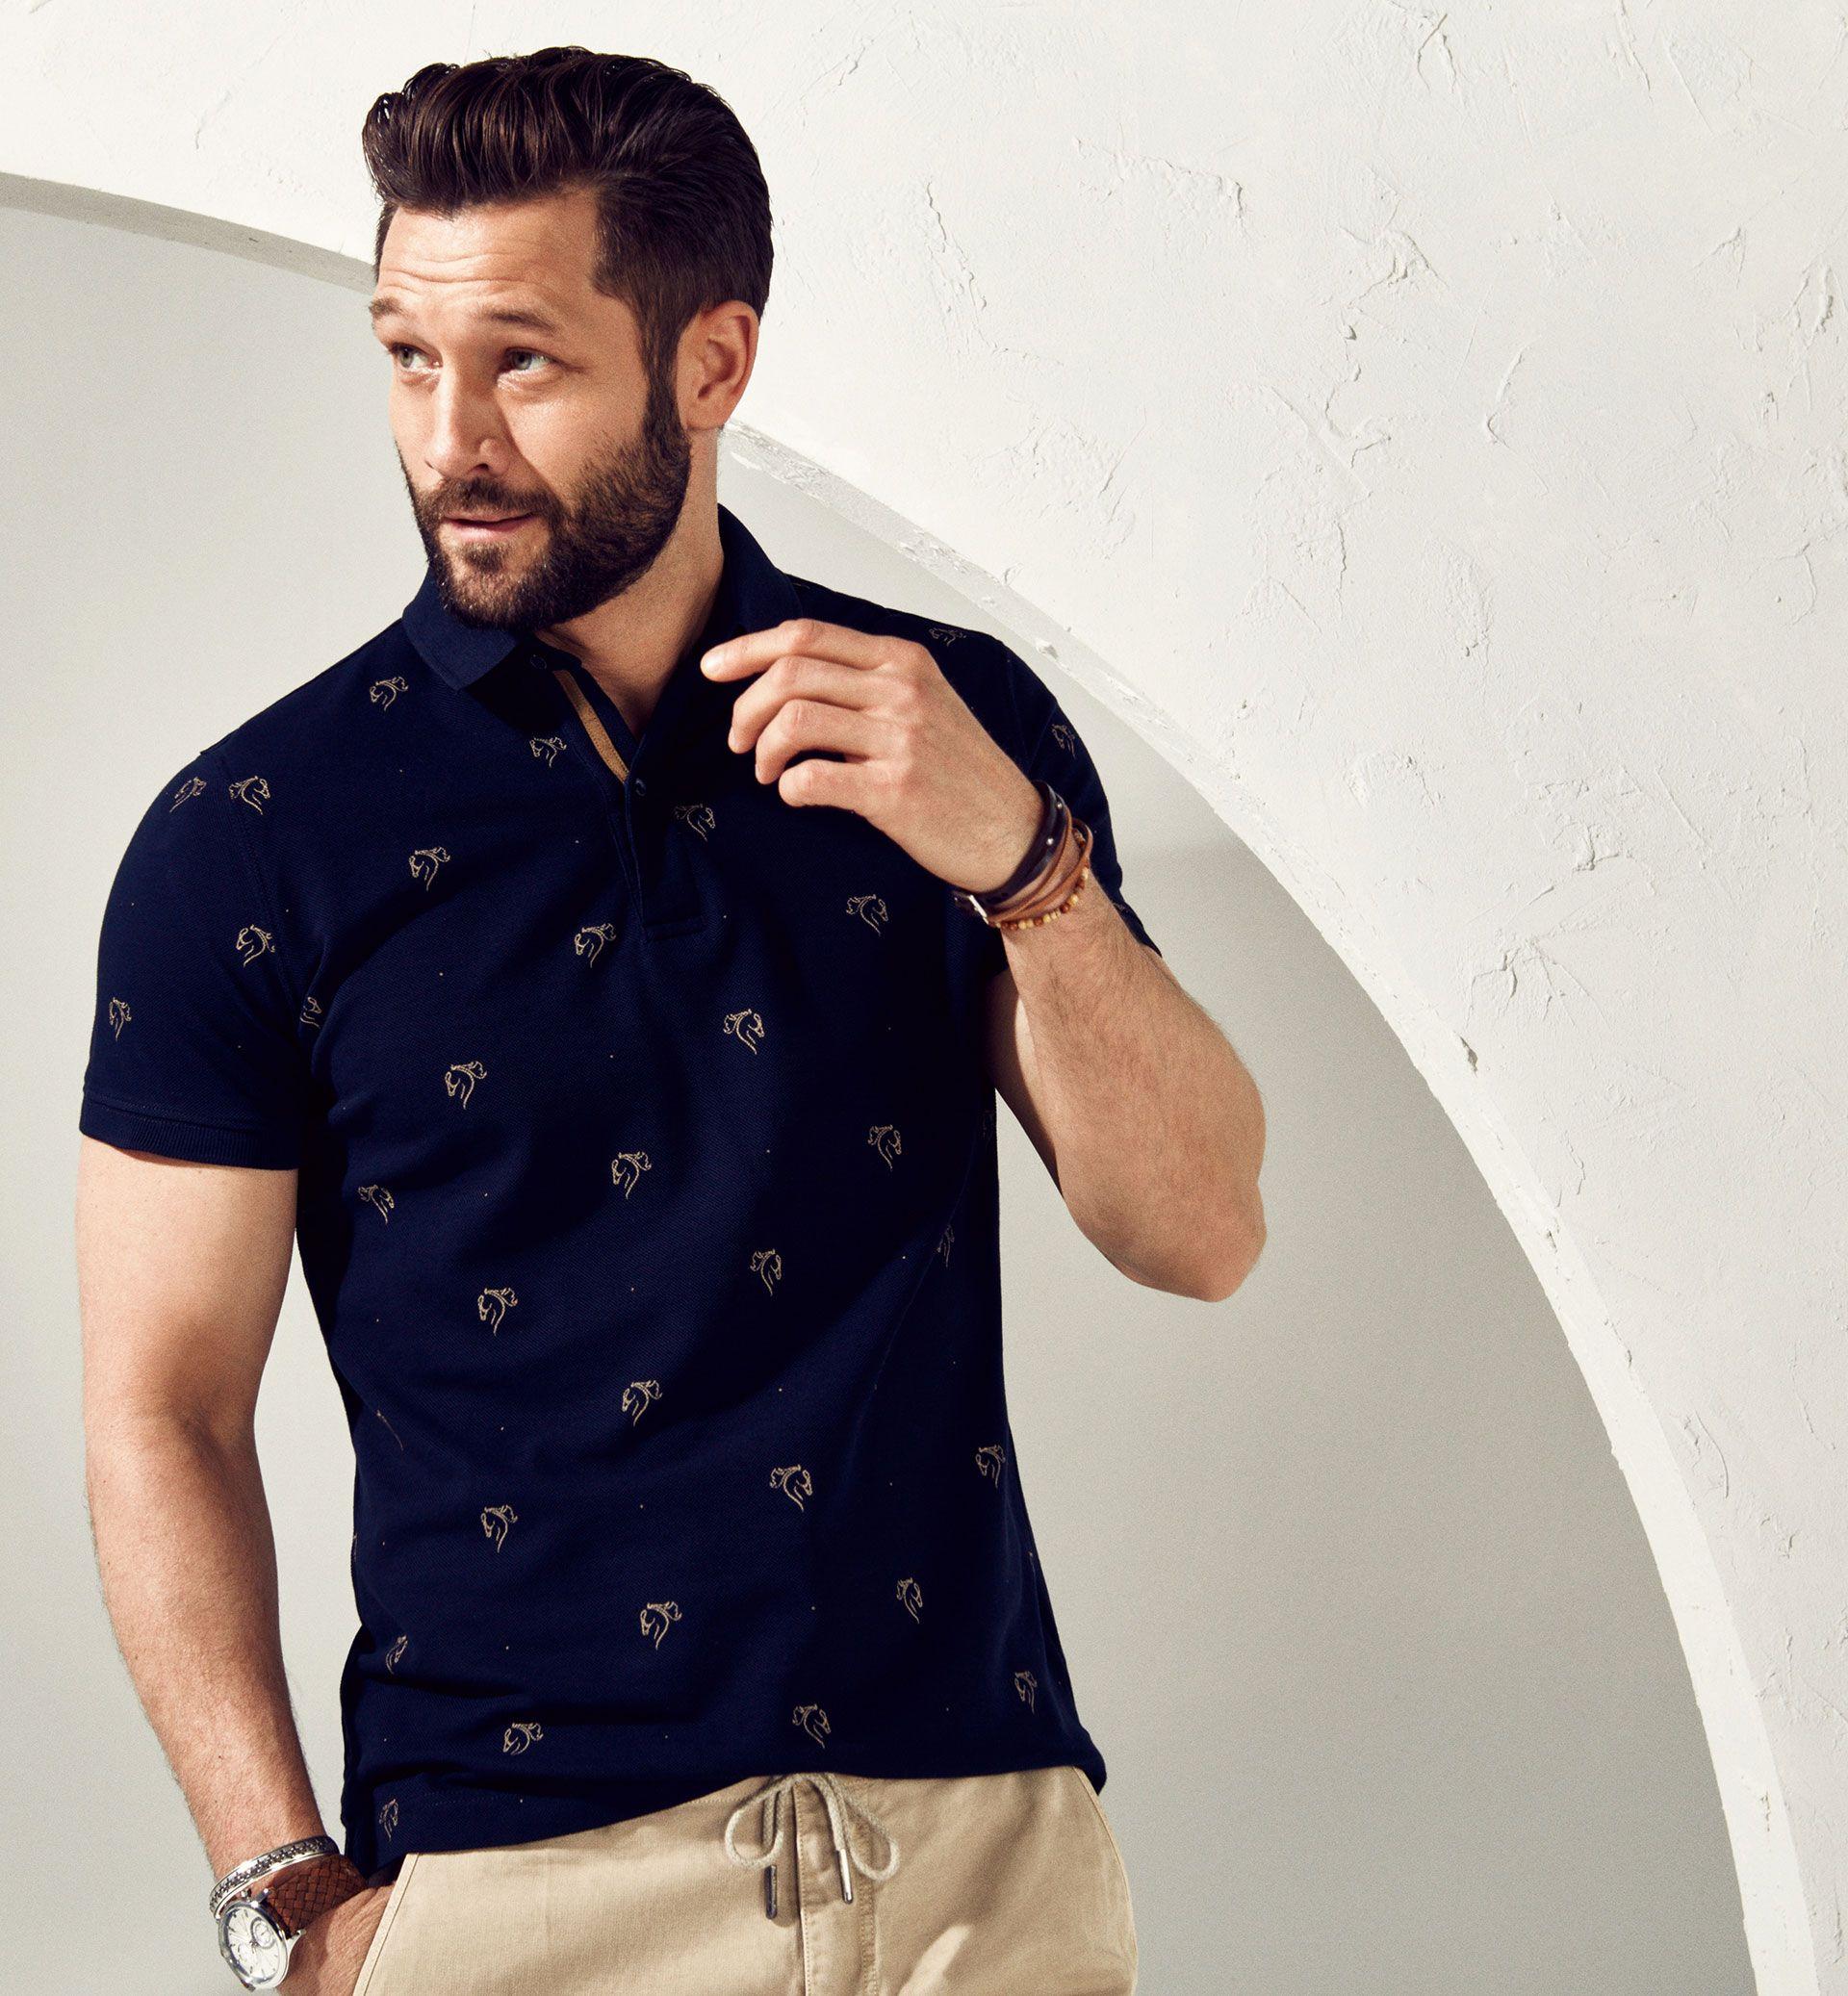 Leg day t shirts men s polo shirt slim - Limited Edition Equestrian Print Polo Shirt Ref 0727 252 Men S Polo Shirtsequestrian